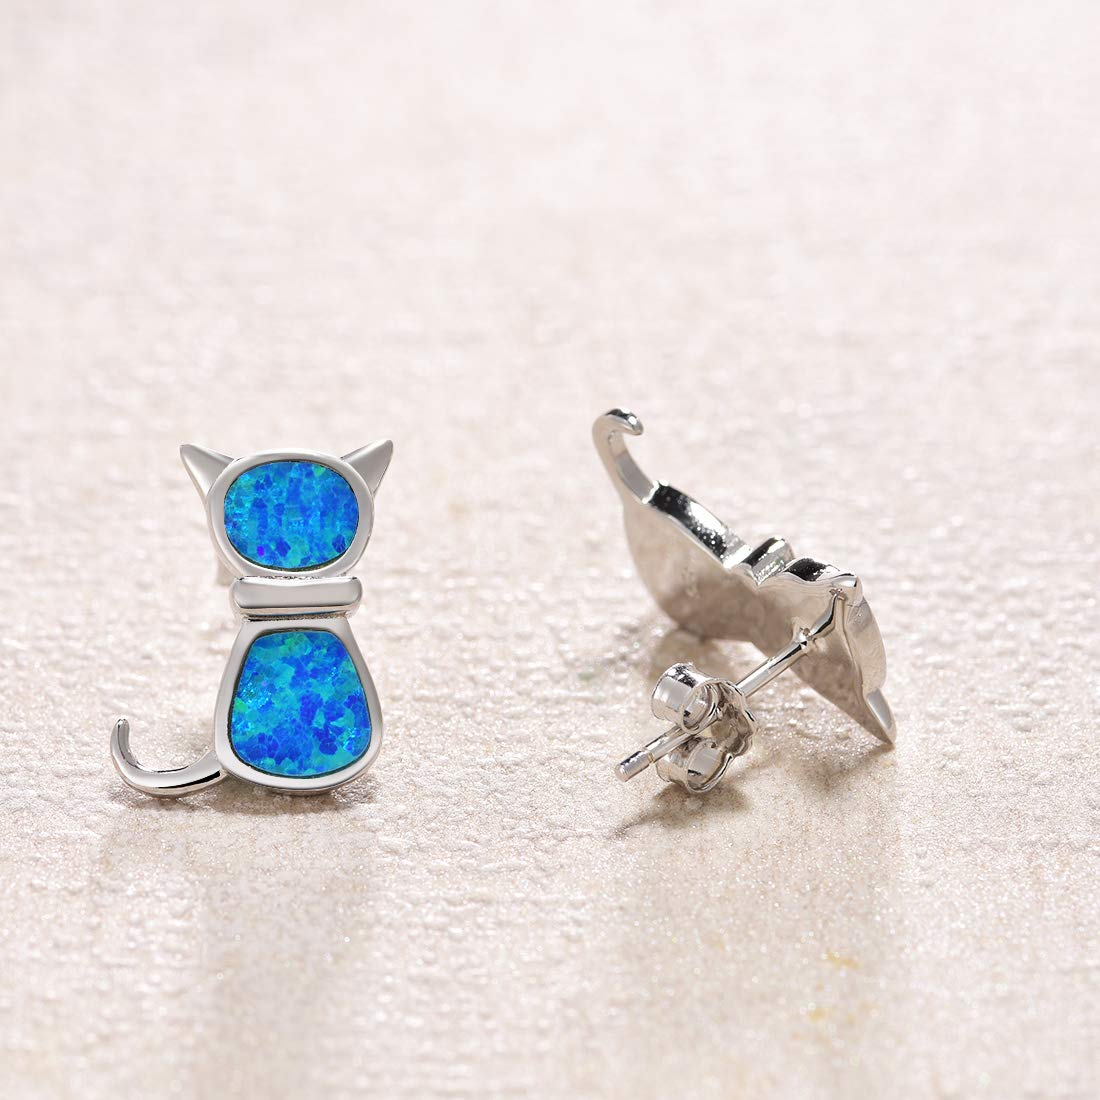 FANCIME 925 Sterling Silver Cat Earrings White Gold Plated Cute Kitty Blue Aqua Created Opal Stud Earrings For Women Girls